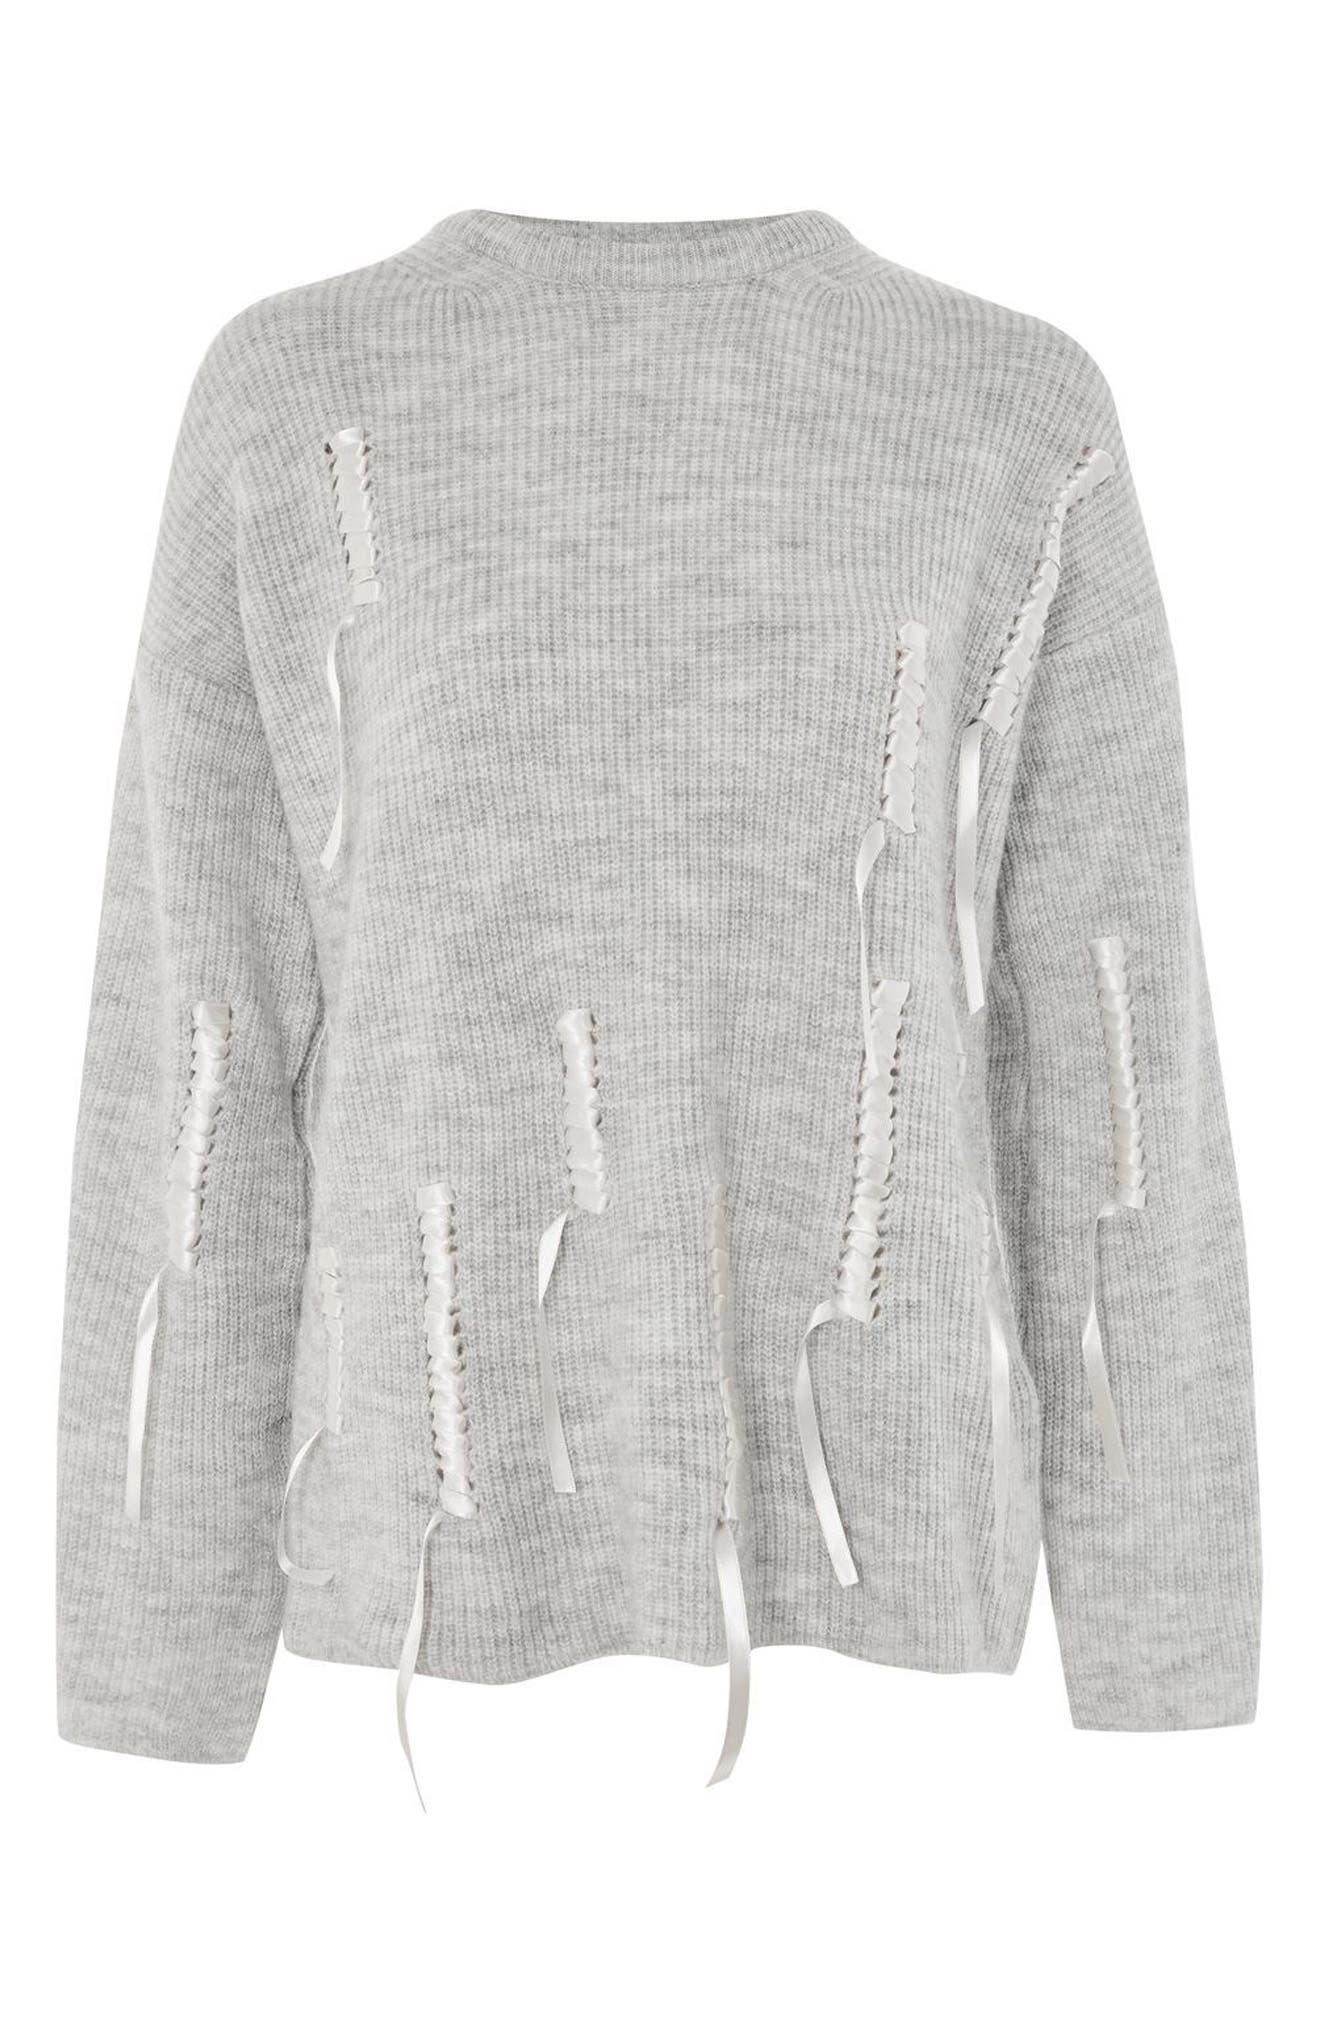 Ribbon Detail Sweater,                             Alternate thumbnail 4, color,                             Grey Marl